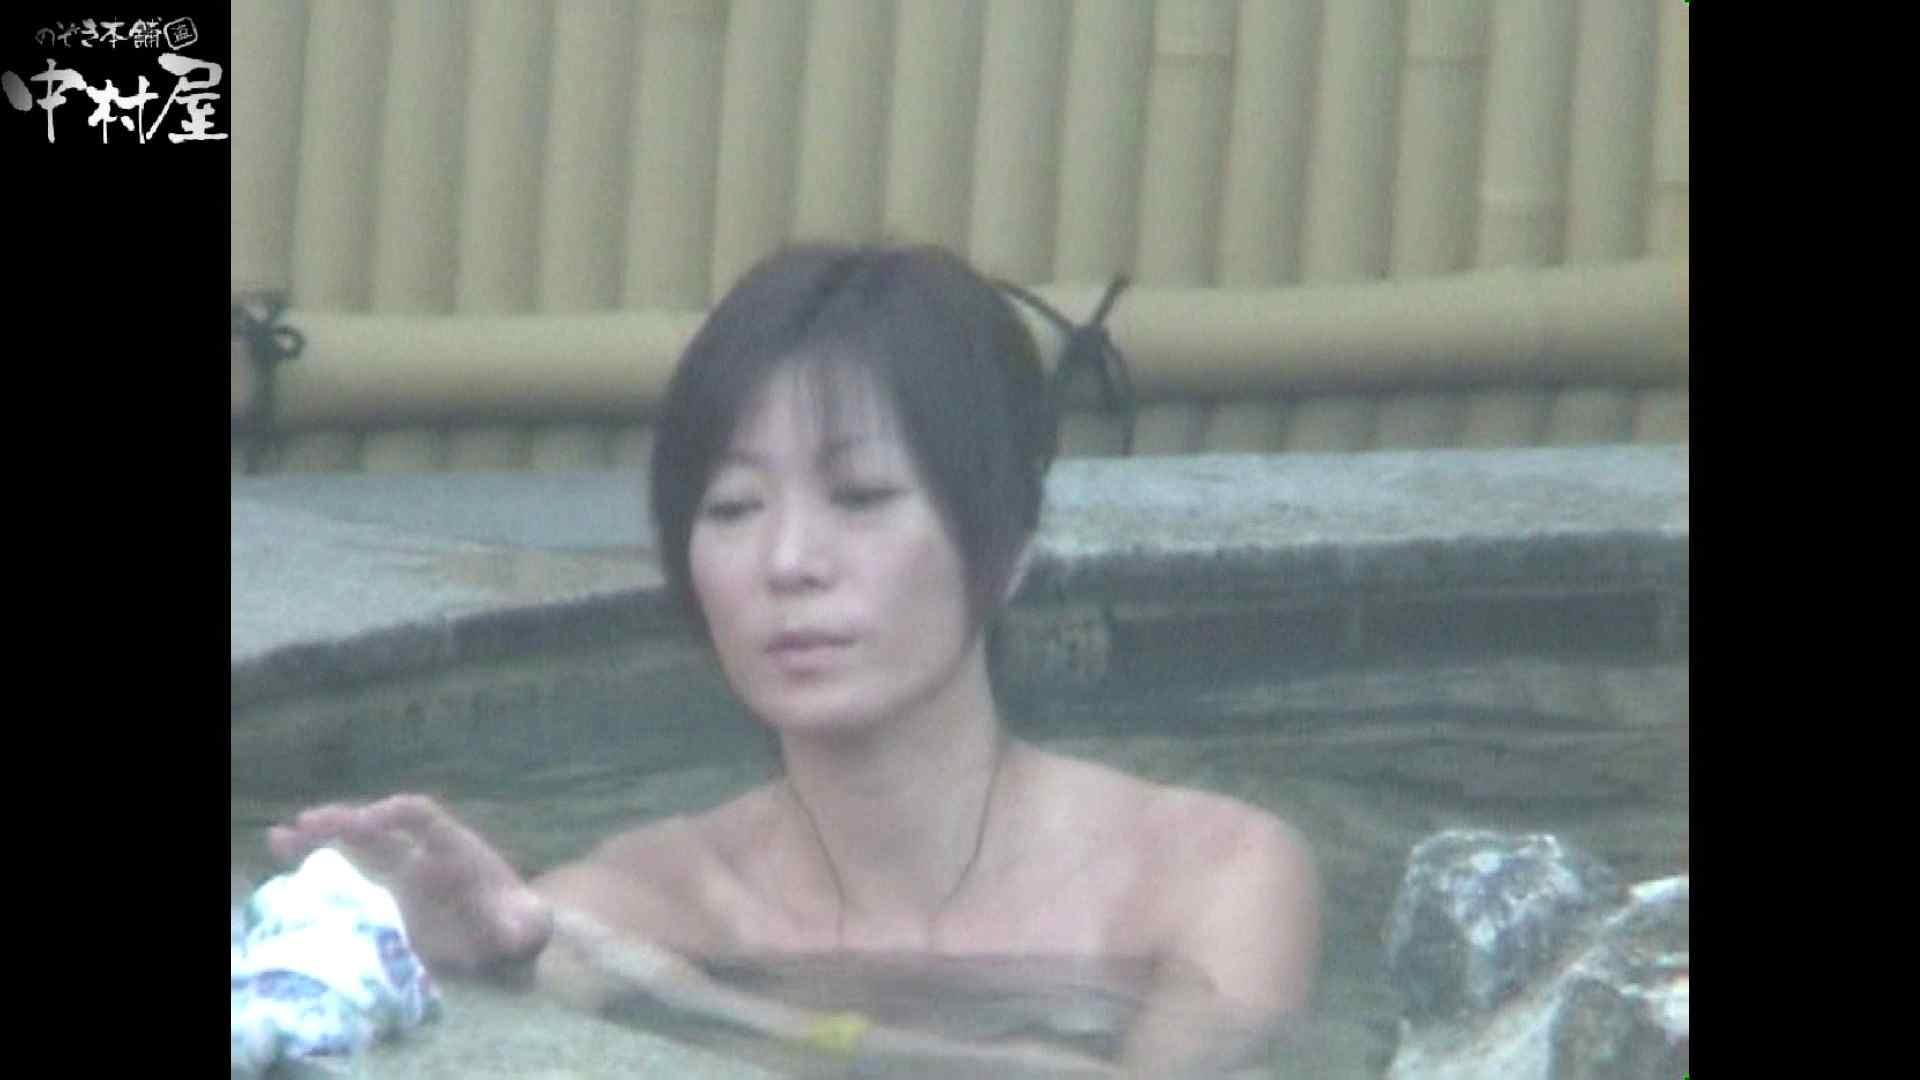 Aquaな露天風呂Vol.972 盗撮 おまんこ動画流出 80画像 71